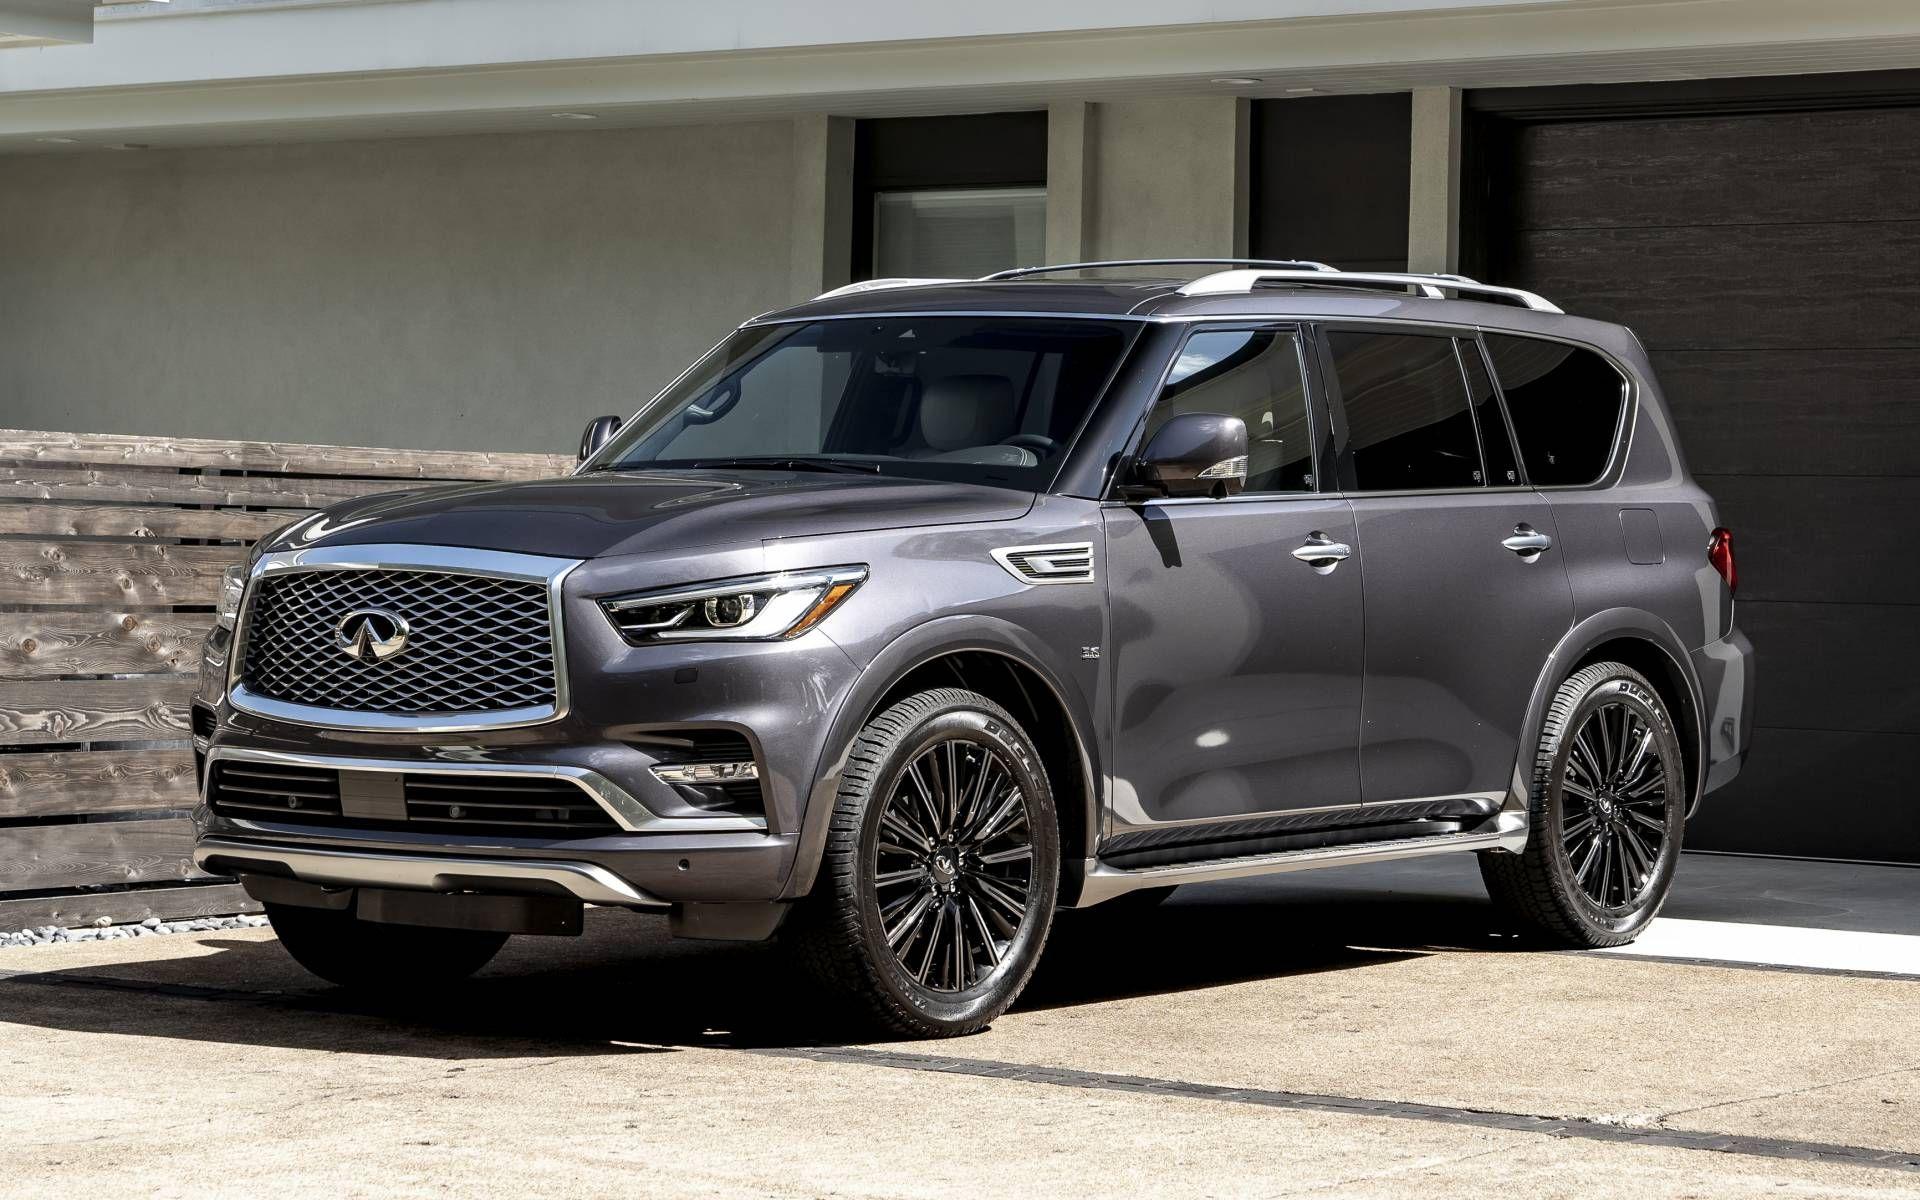 Car Industry Latest News Updates Autodeals Pk In 2020 Luxury Suv Infiniti Suv